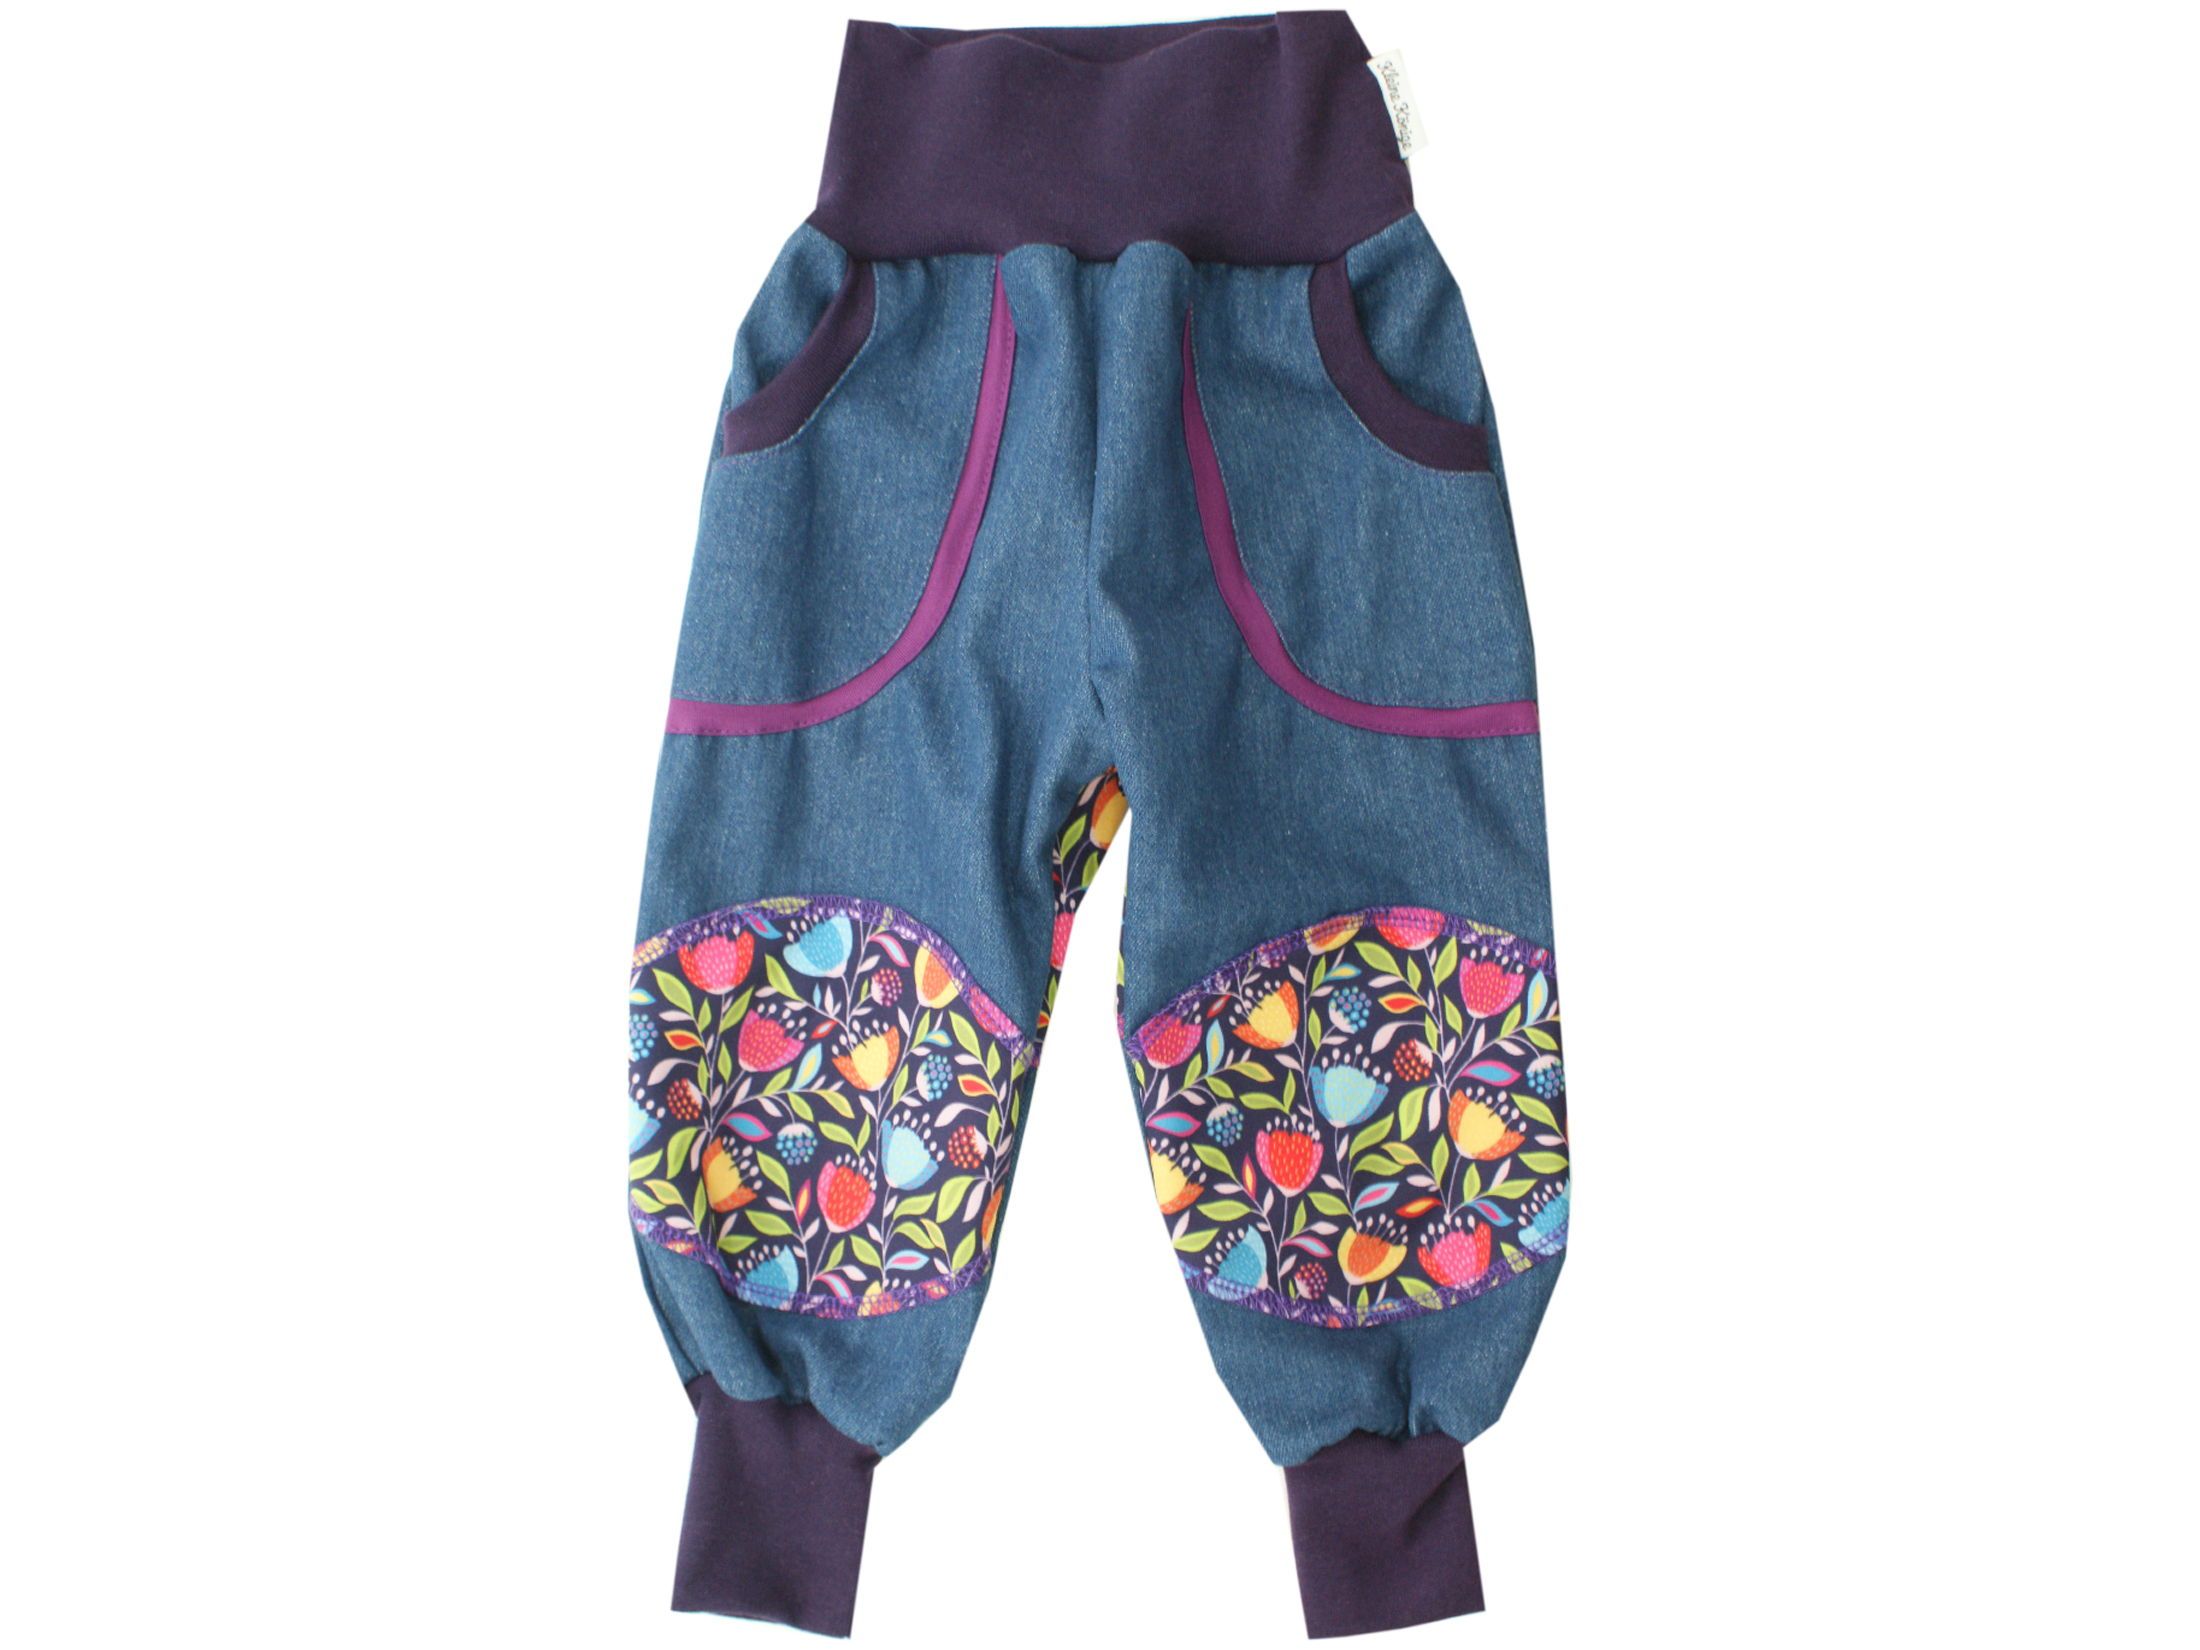 "Kinder Outdoorhose Jeans Räuberhose ""Blümchen"" lila"